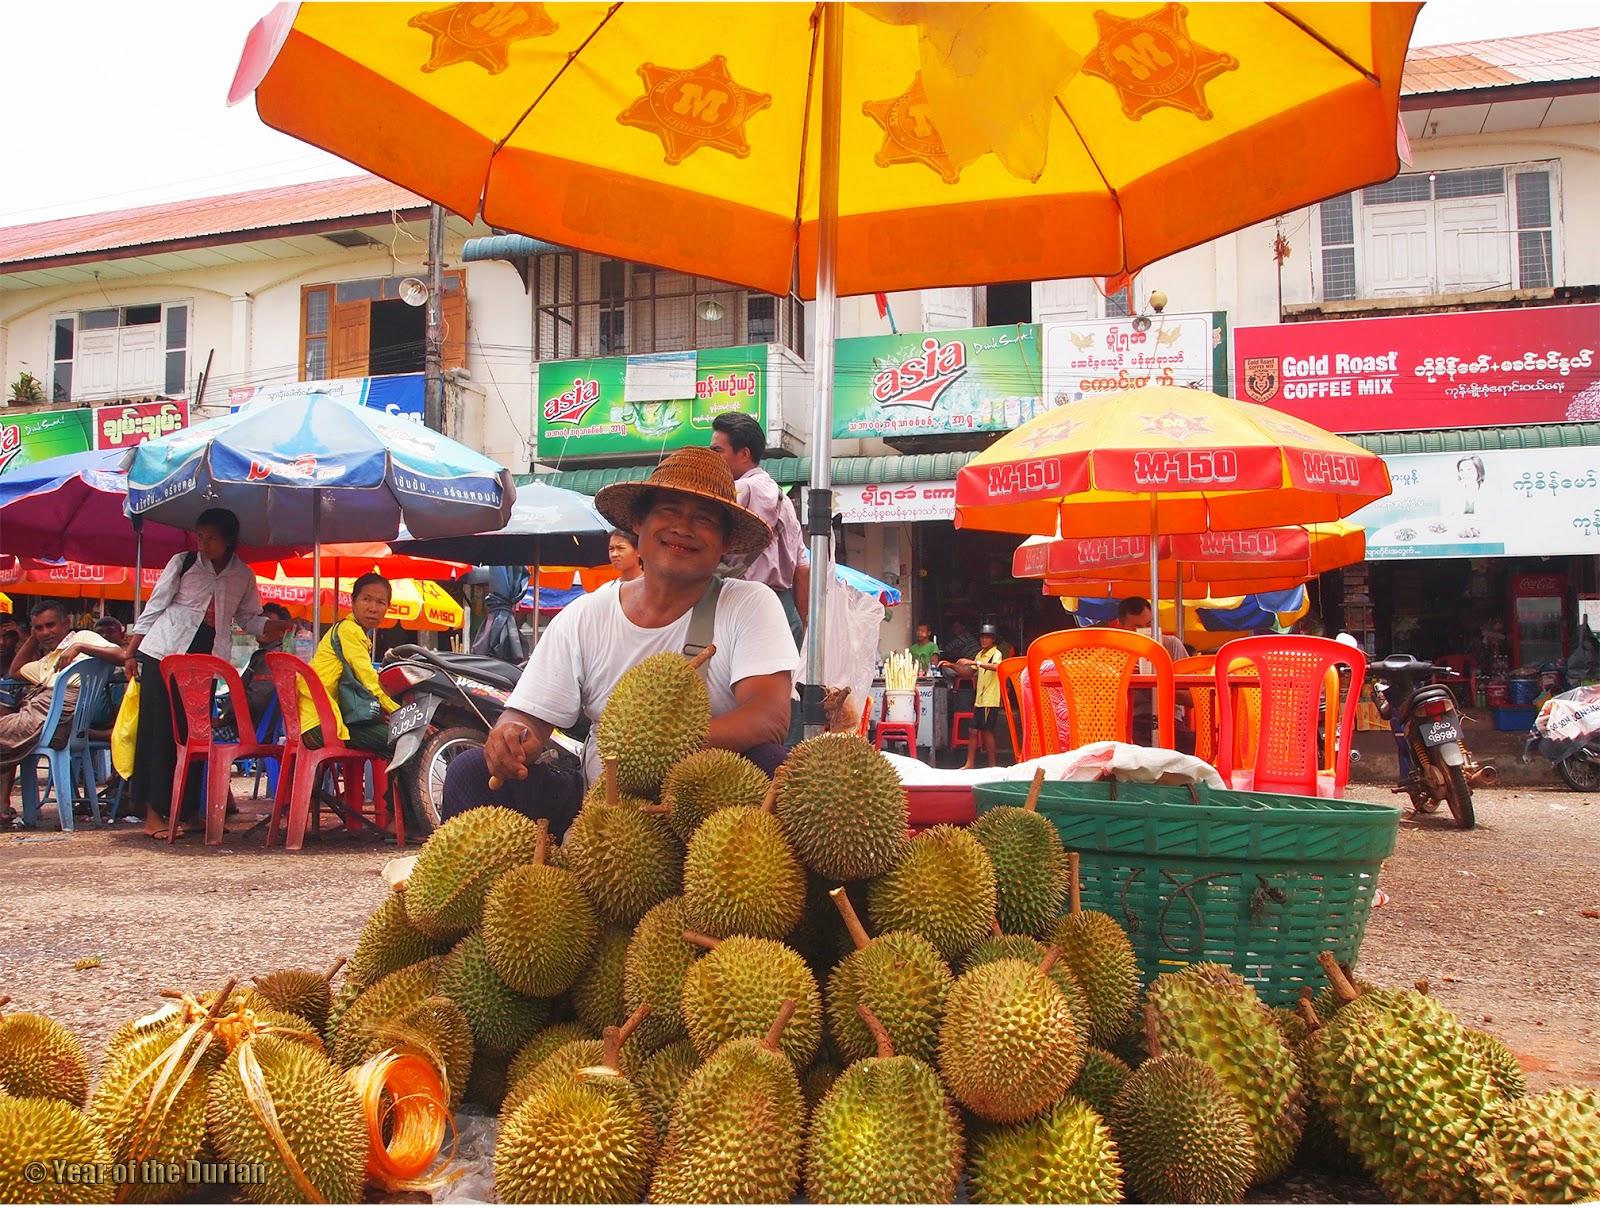 Mawlamyine Myanmar  city photos : Learning to Chillax And Just Enjoy The Durian| Mawlamyine, Myanmar